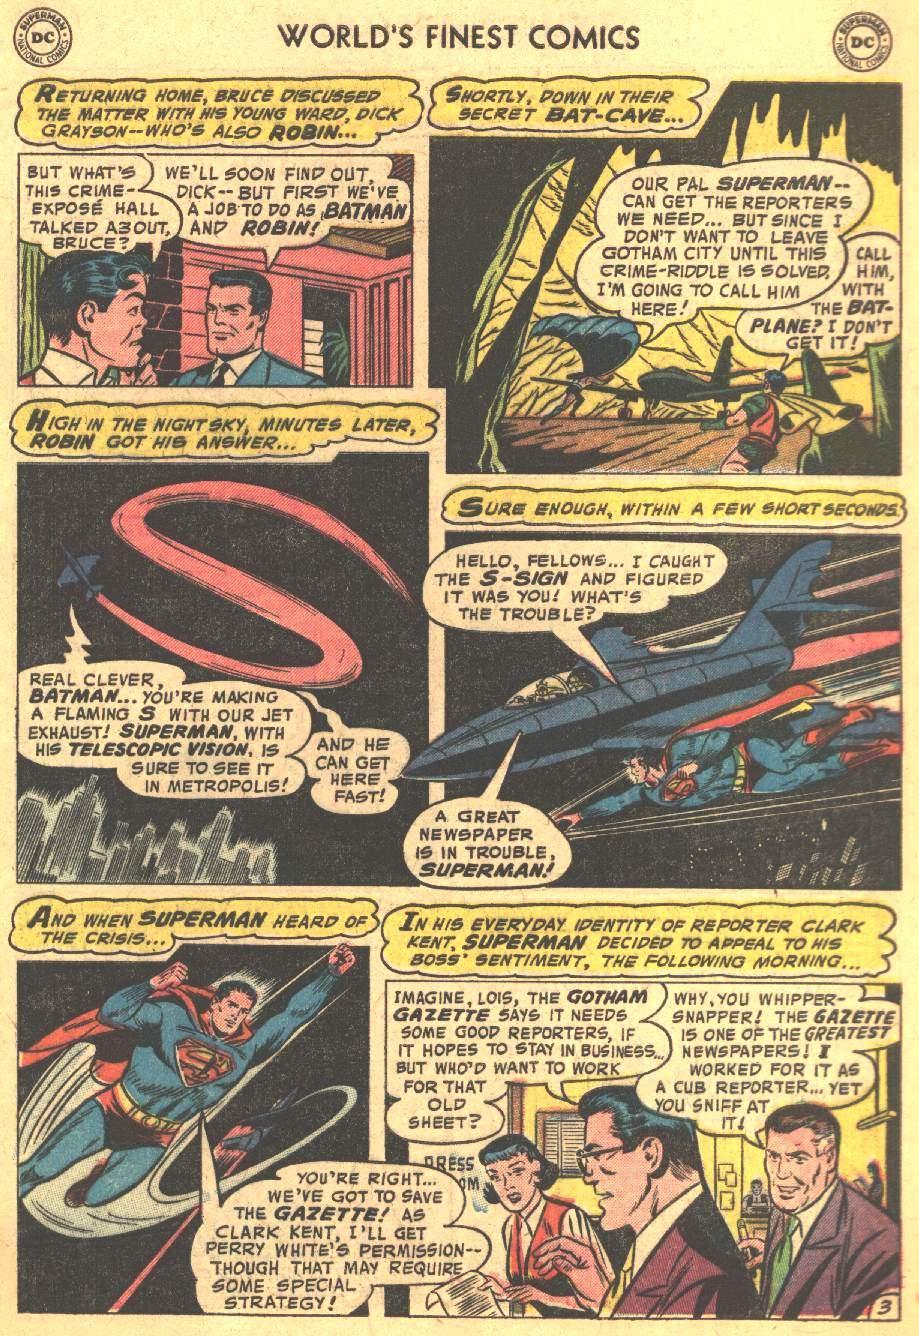 Read online World's Finest Comics comic -  Issue #80 - 5